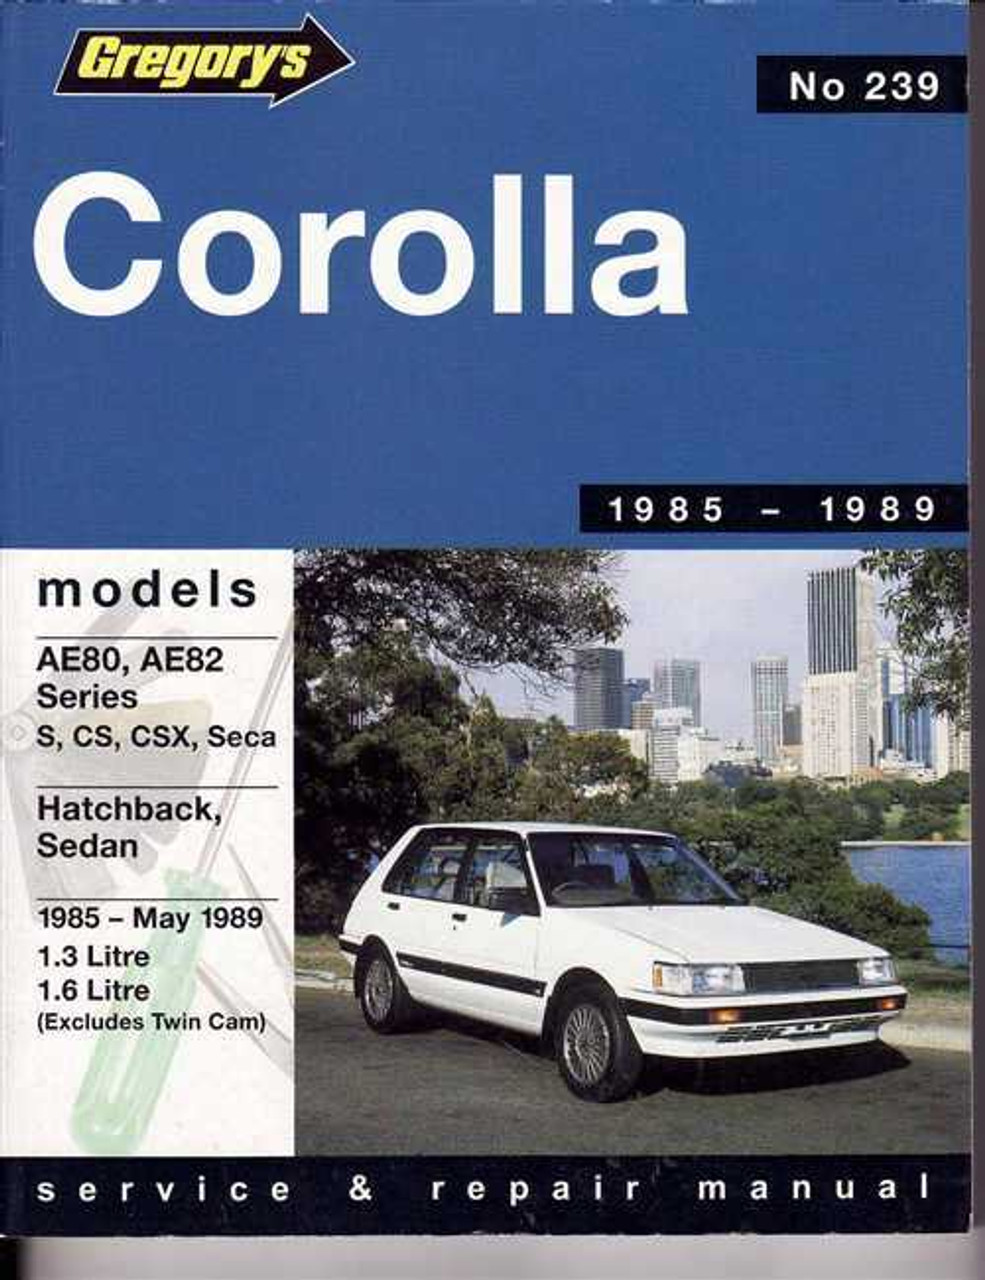 toyota corolla fwd ae80 ae82 series 1985 1989 workshop manual rh automotobookshop com au Toyota Corolla FX16 AE82 Toyota Corolla Interior